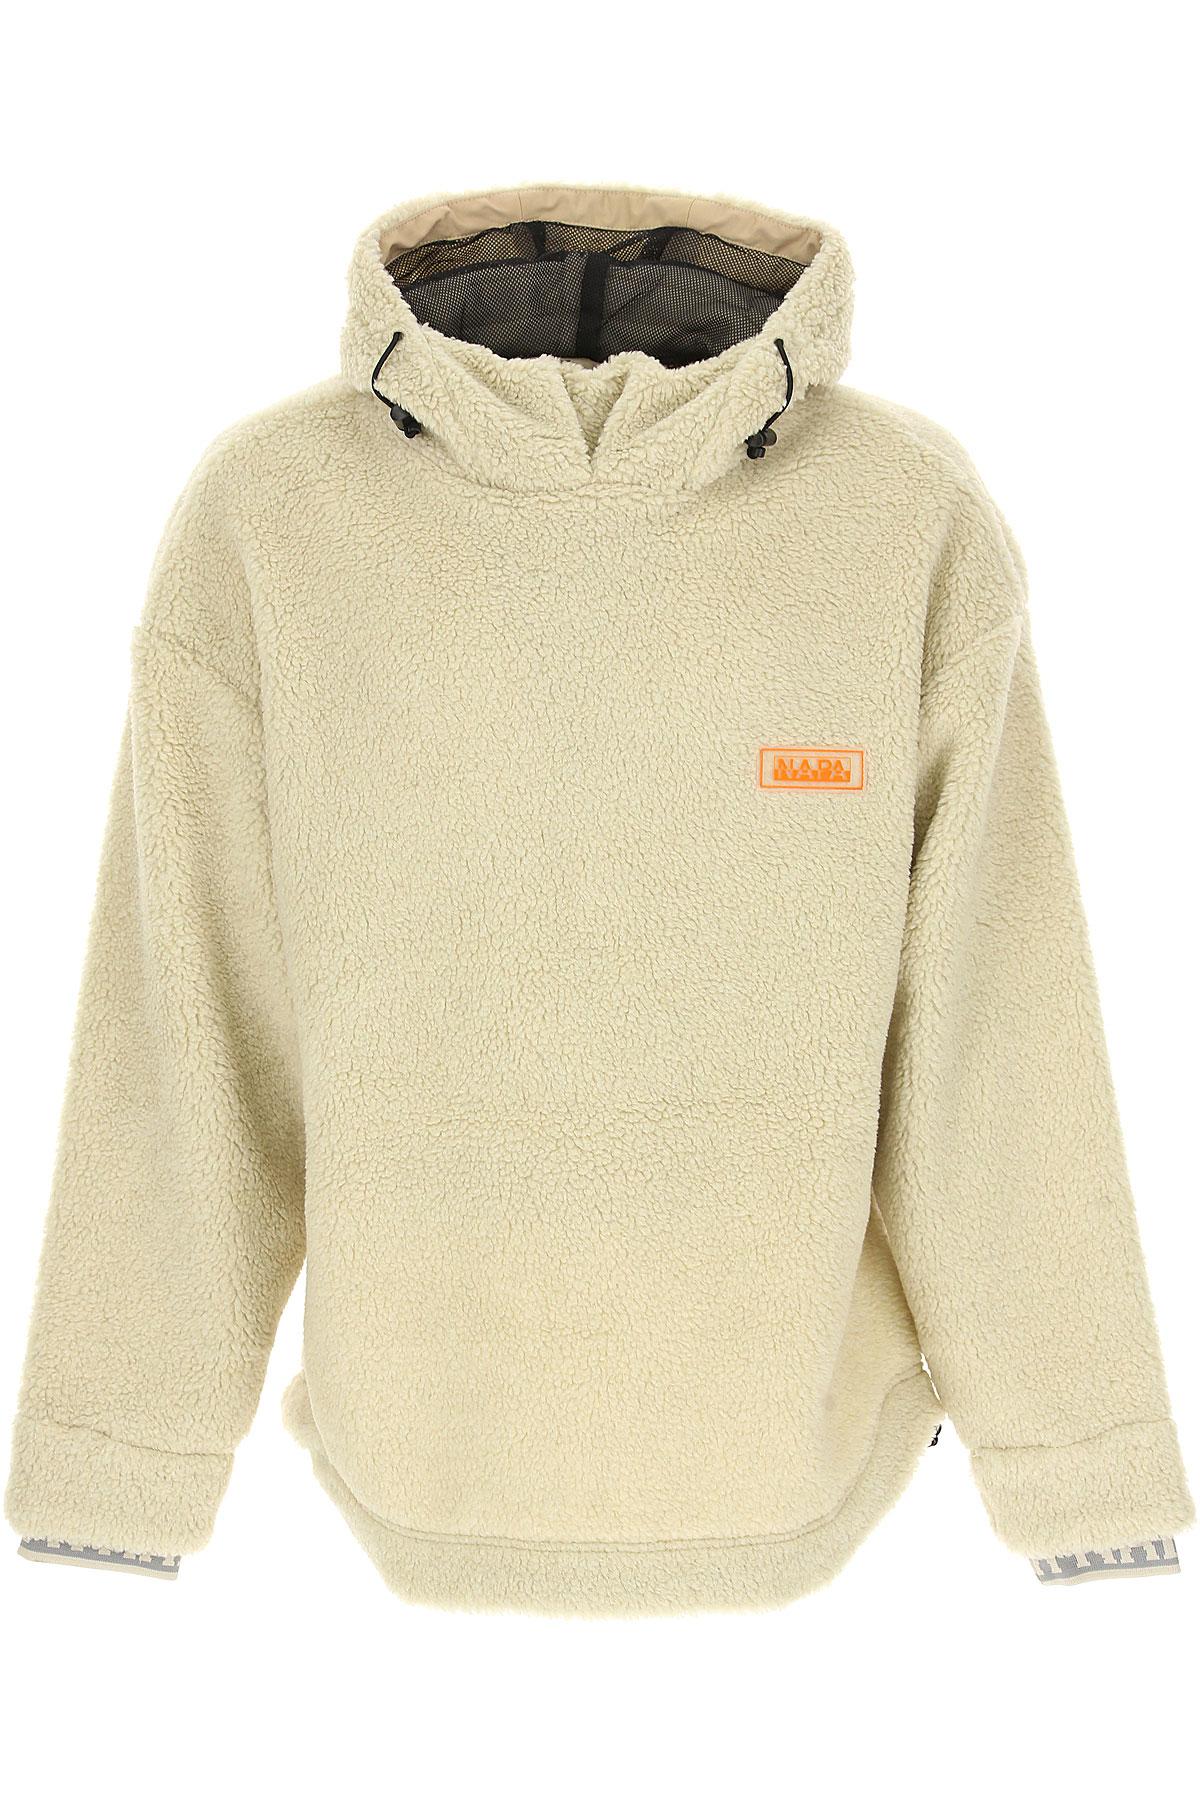 Image of Napapijri Sweater for Men Jumper, Natural, polyester, 2017, L M S XL